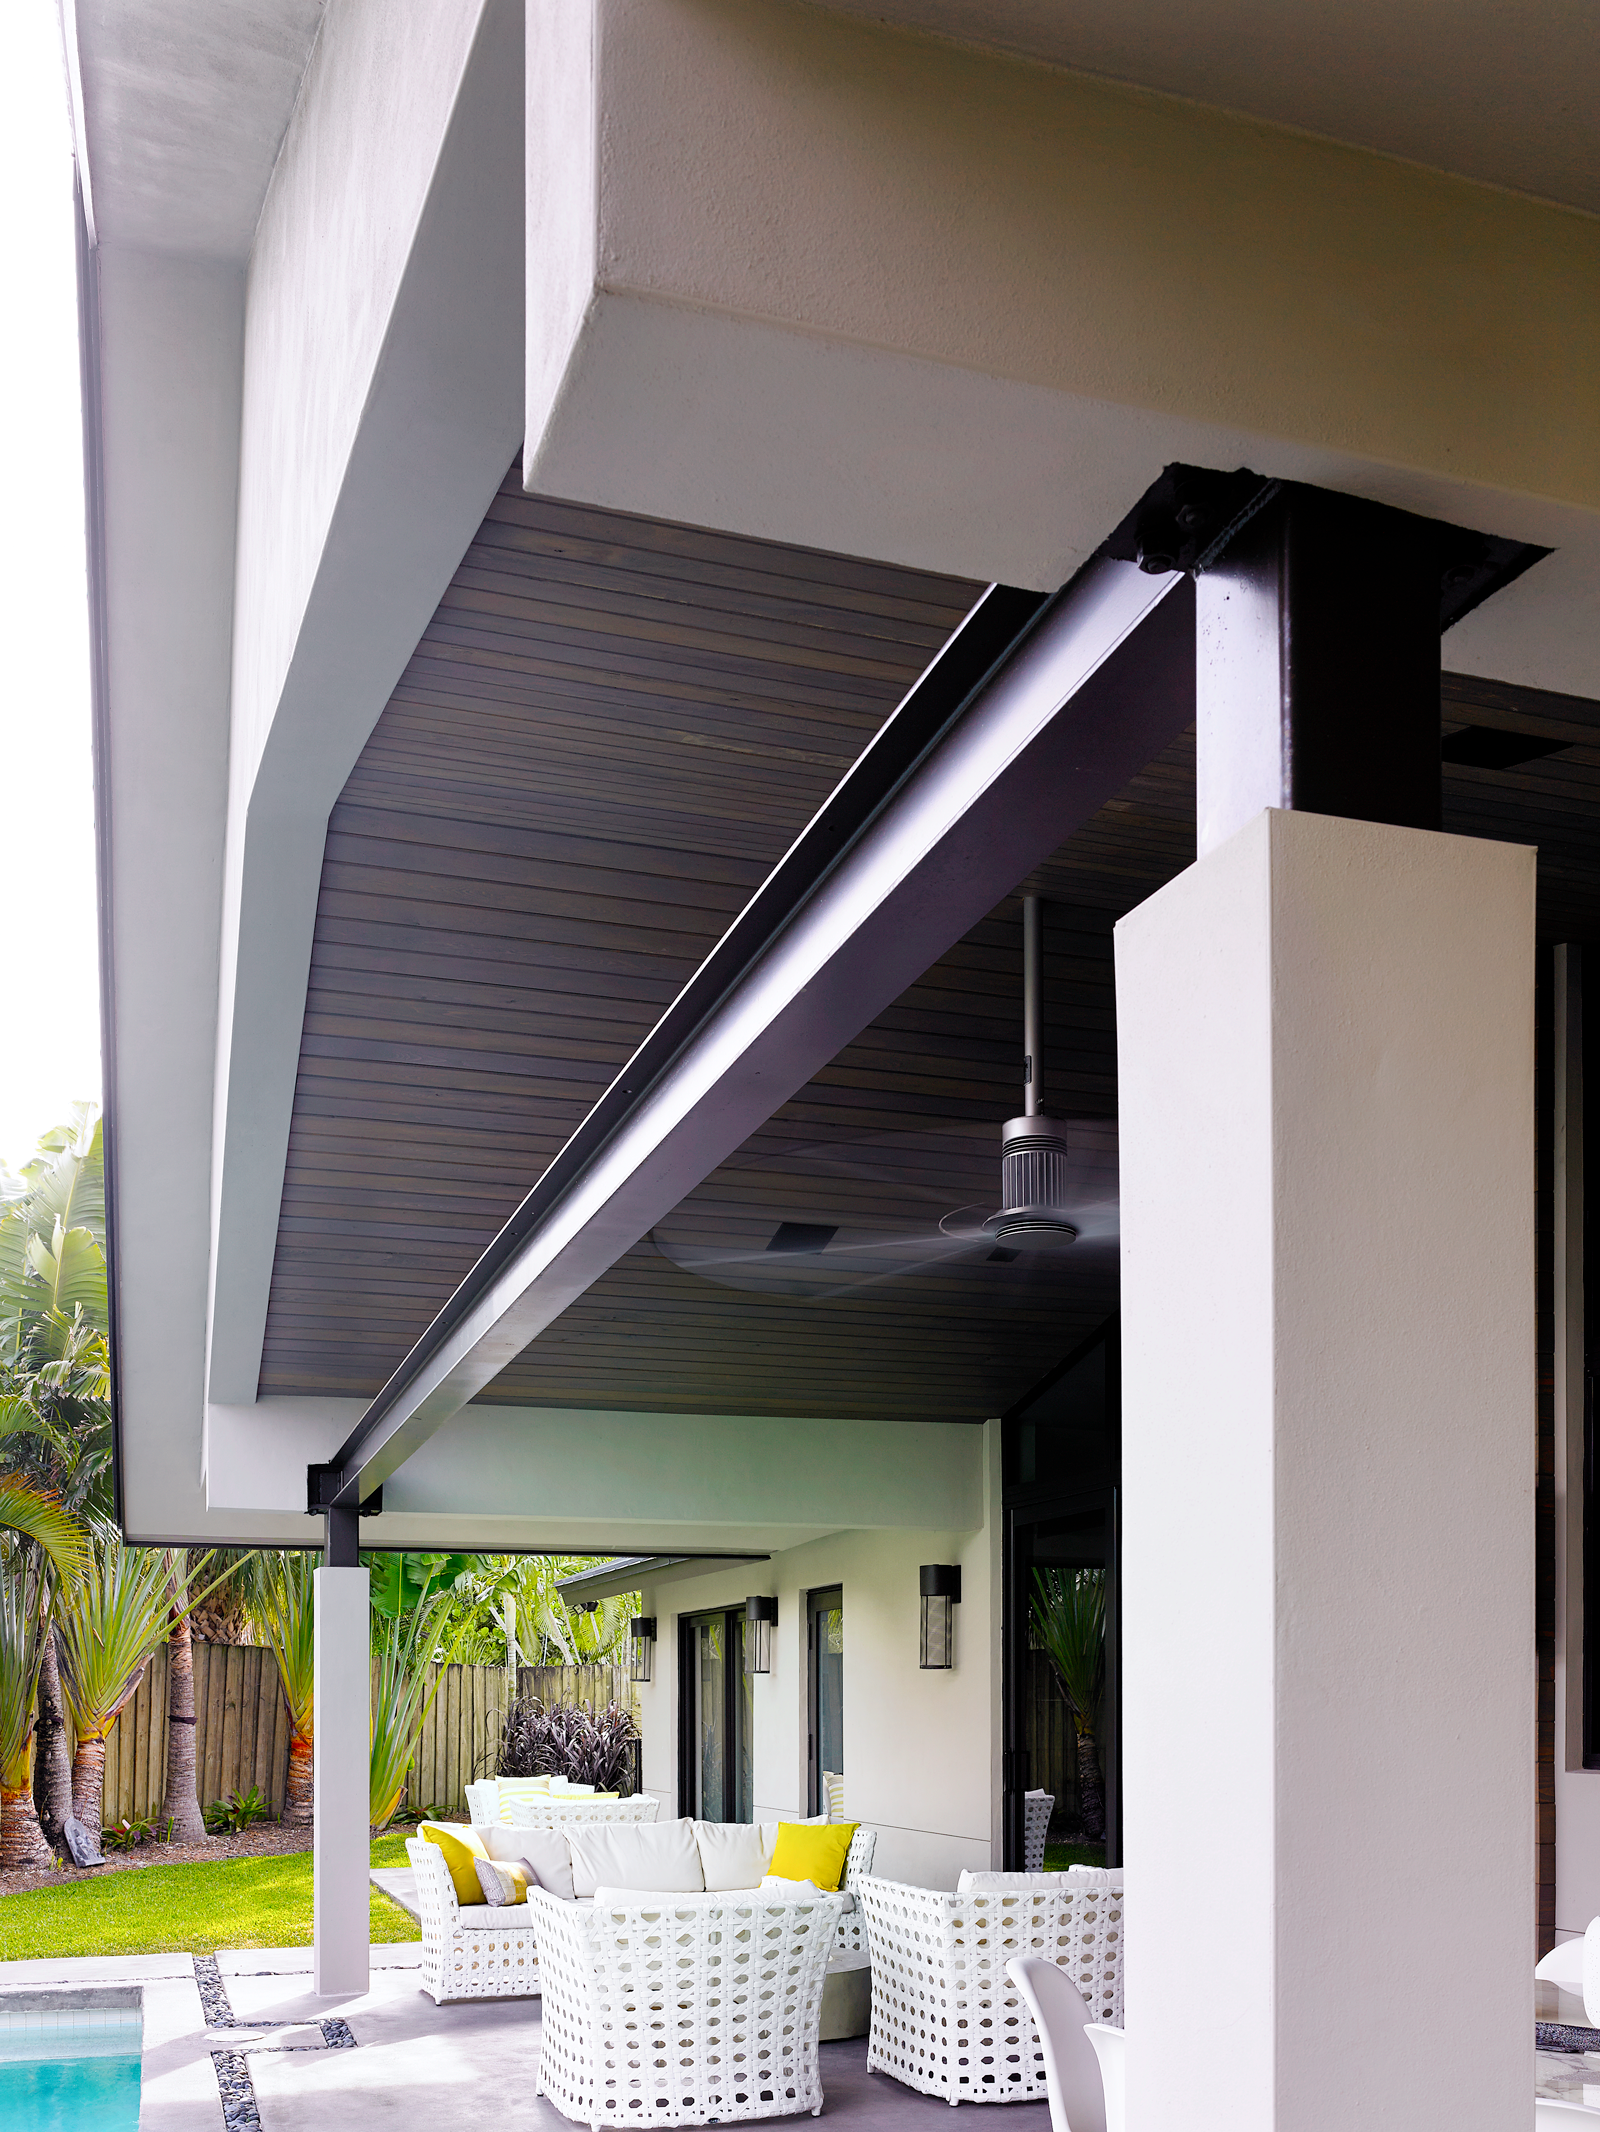 Carlos-Domenech-Brett.Giselle25544--B&G-Design---May-12-2014--037_2132.png